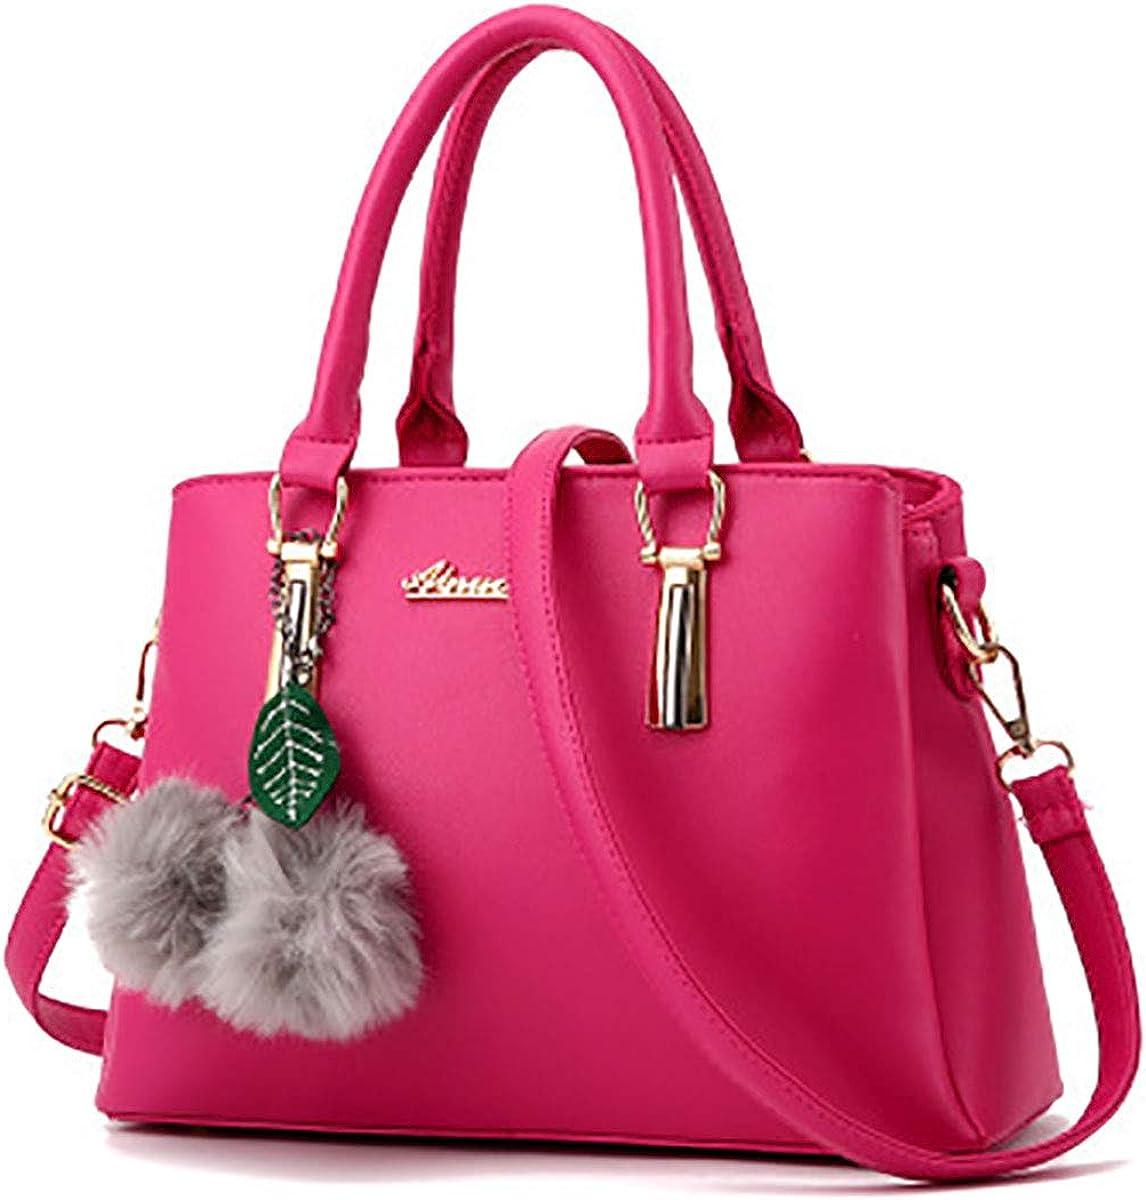 YOUNXSL Women Satchel Bags Handle Shoulder Handbags and Purses Pockets Zipper PU Leather Crossbody Bags